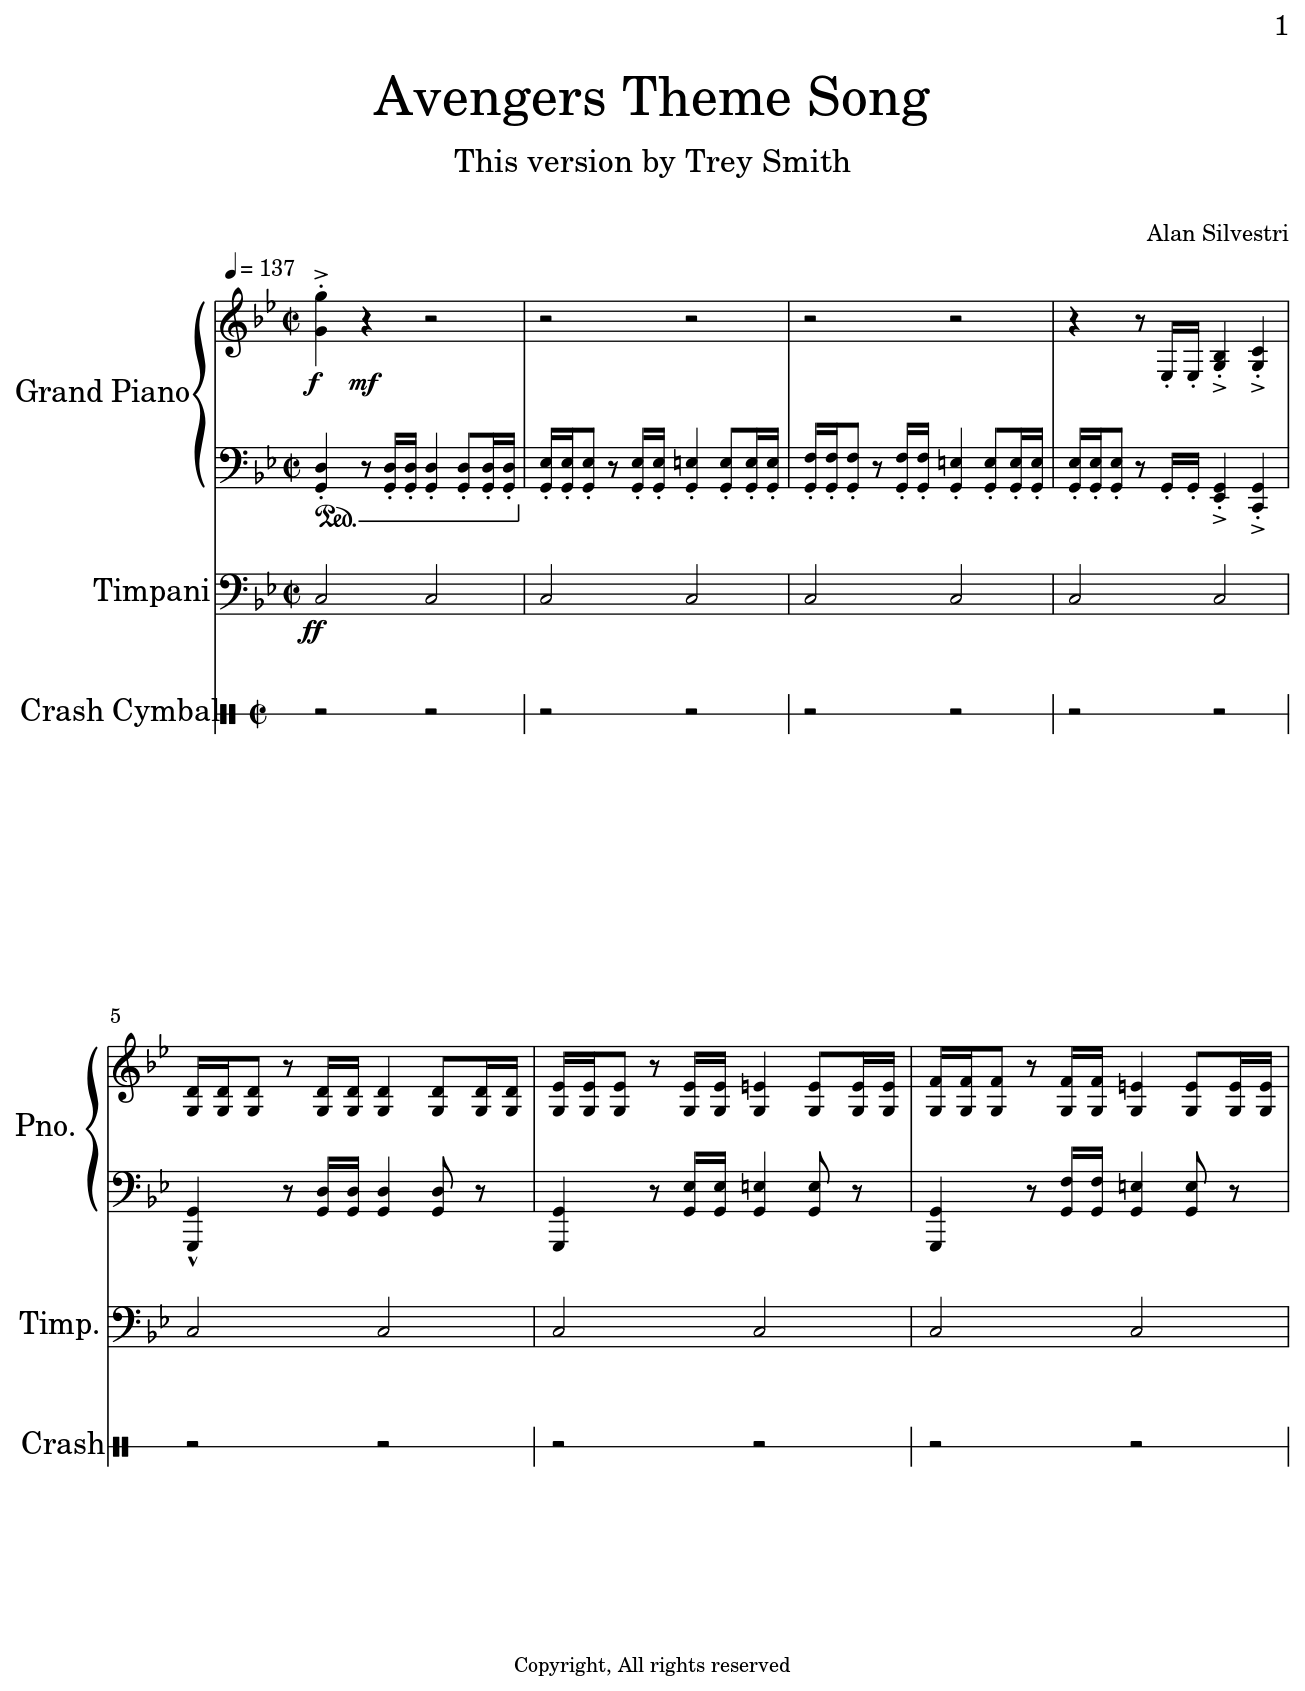 Avengers Theme Song - Flat